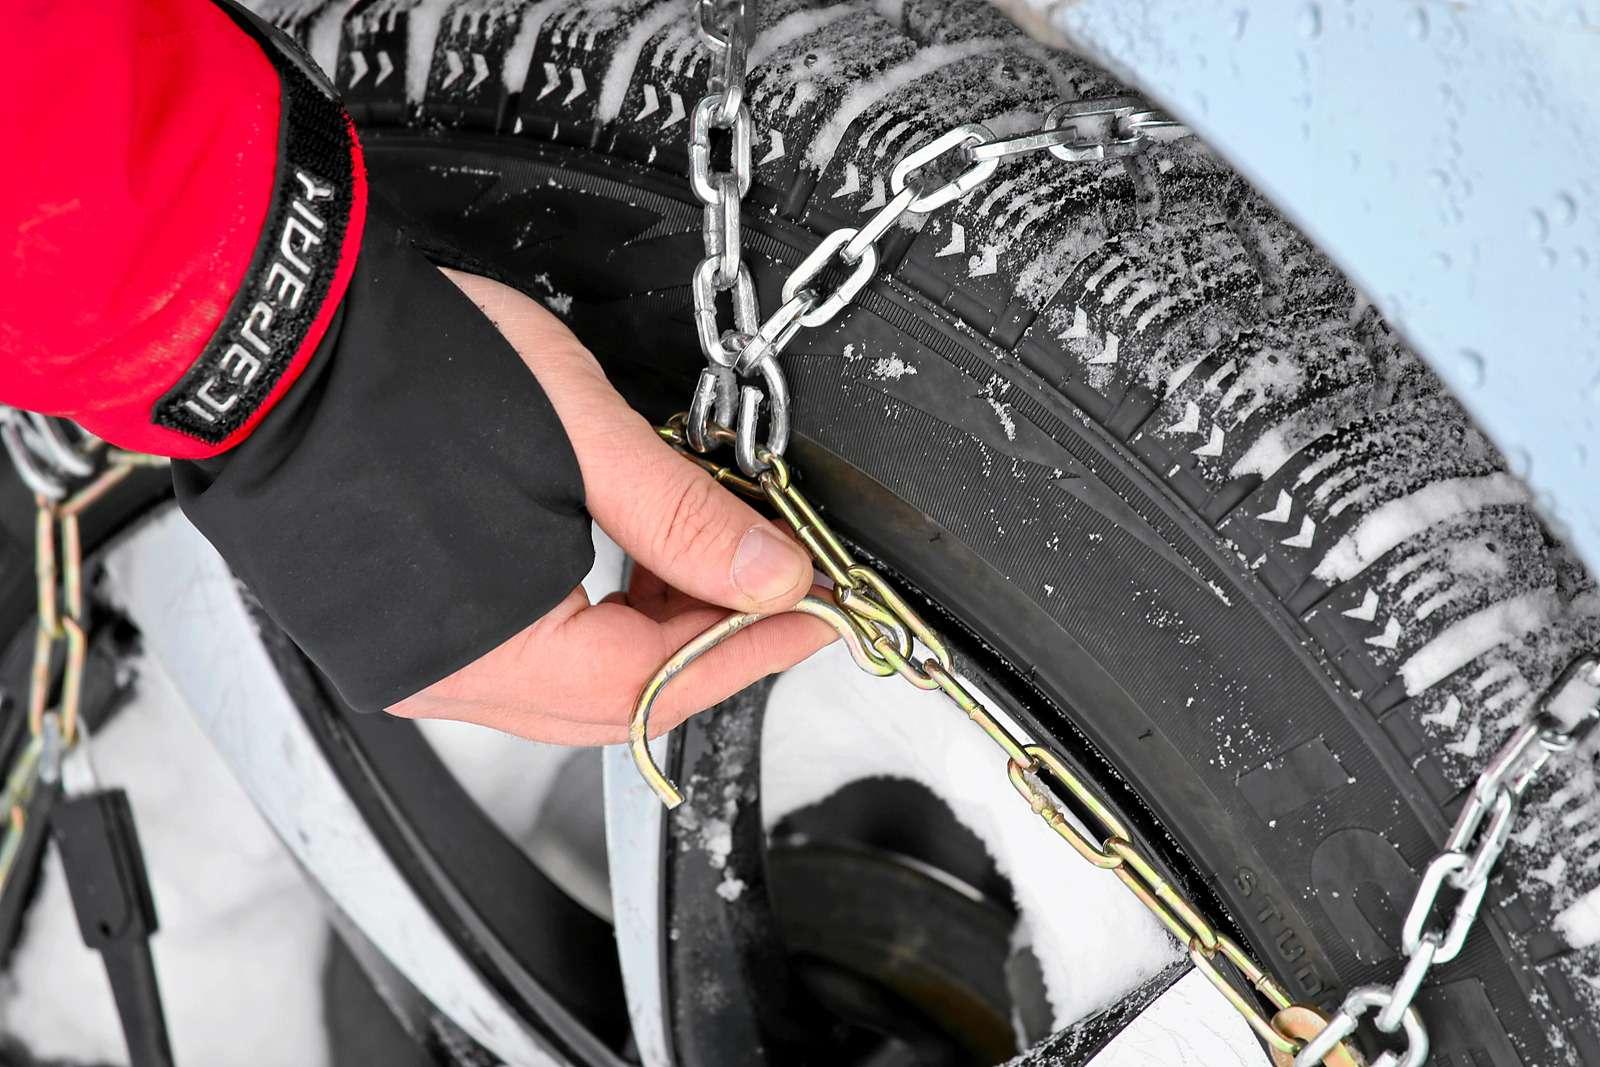 Большой зимний тест: Lada Vesta, Lada XRAY иDatsun mi-DO изпарка ЗР— фото 571446